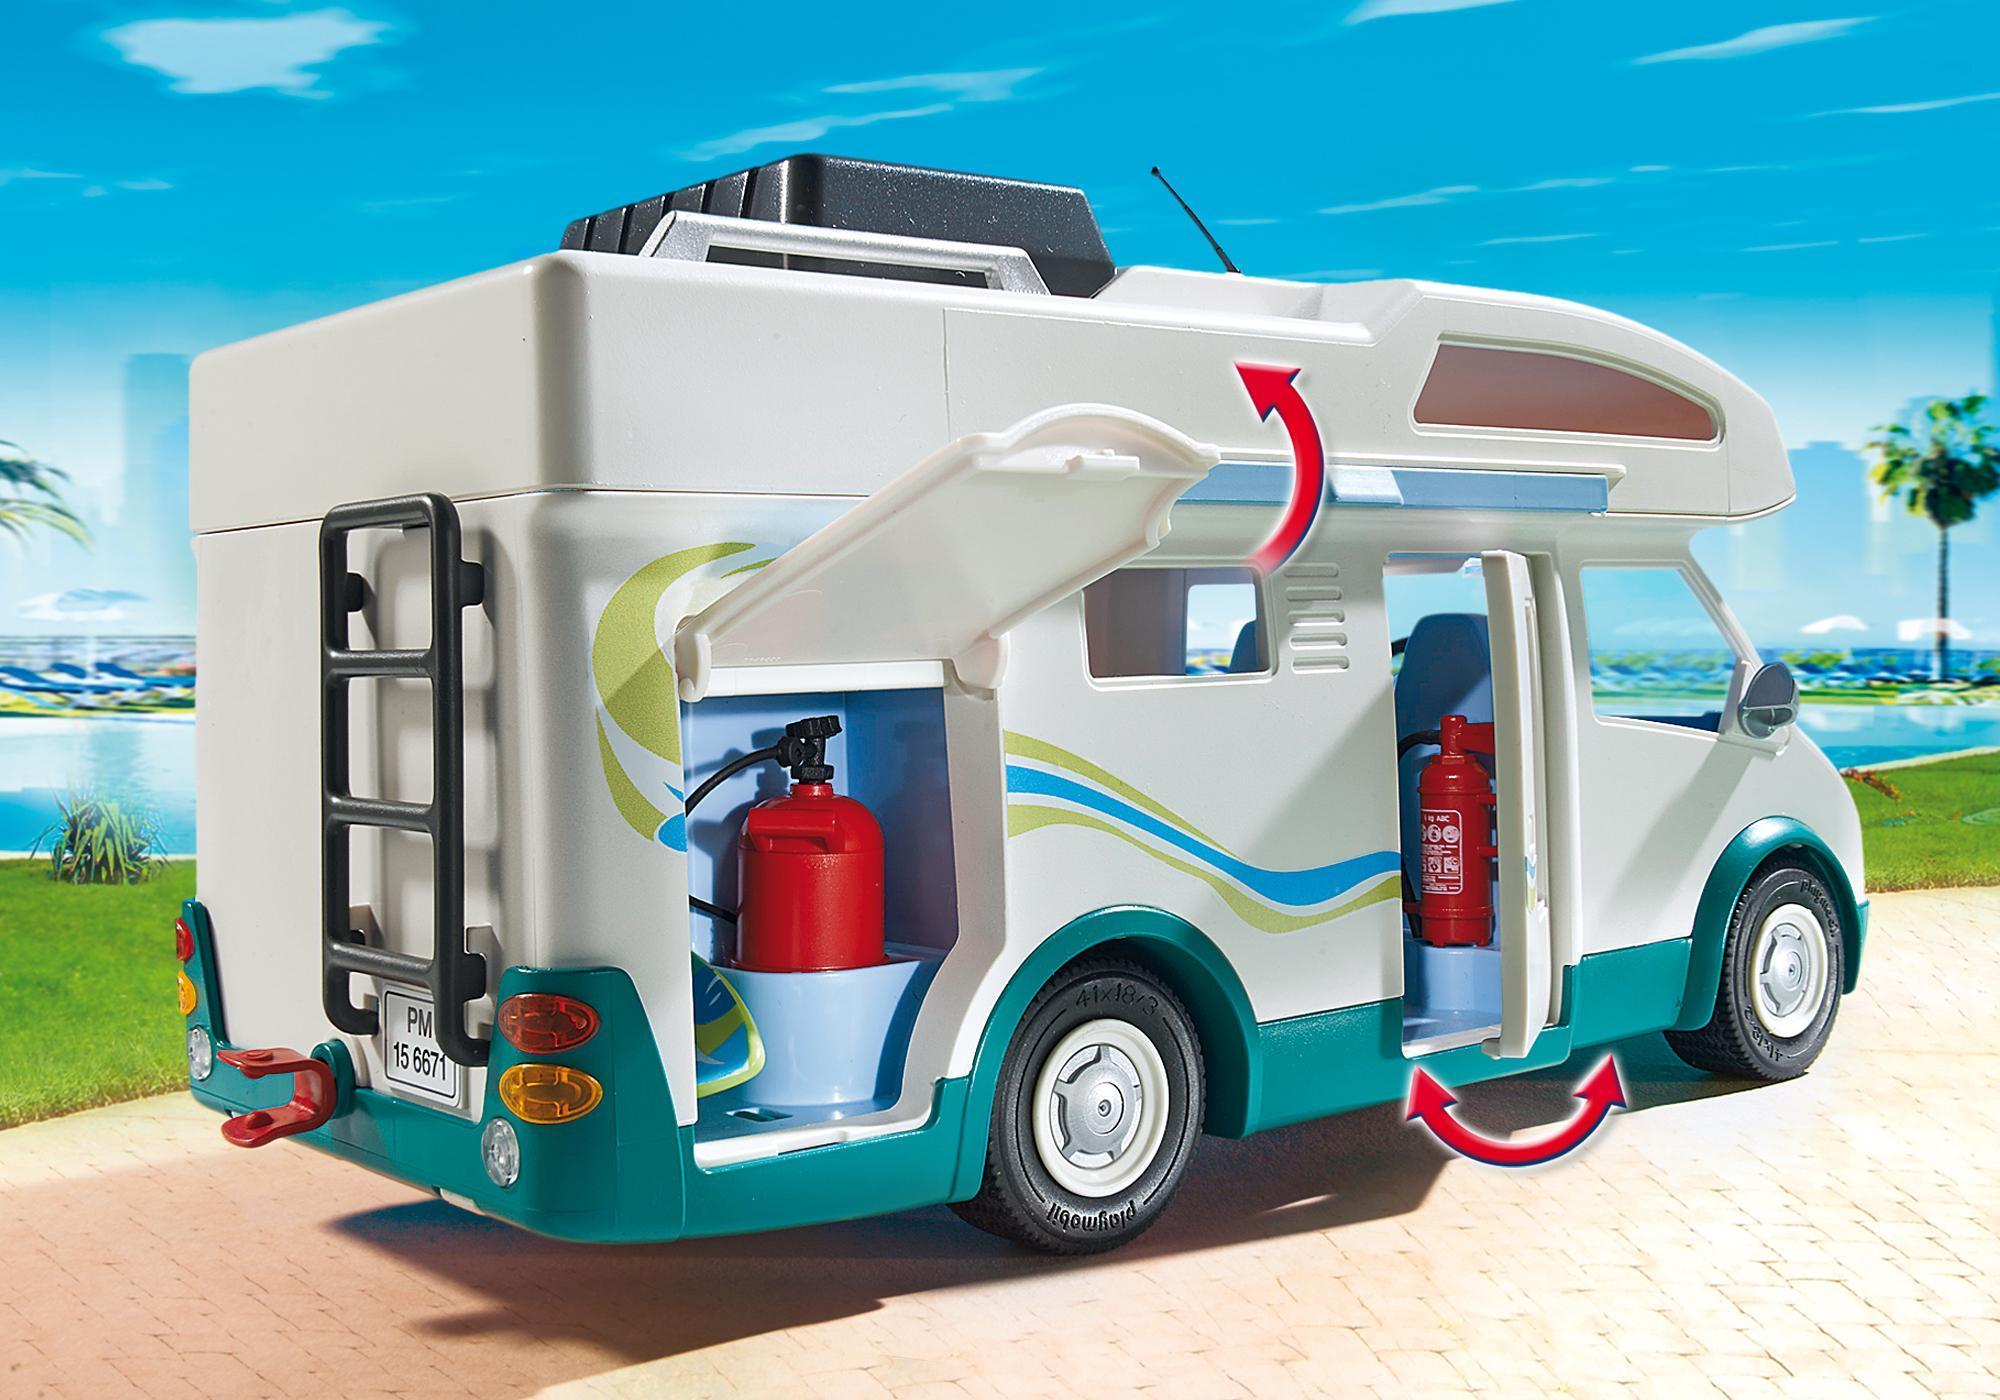 http://media.playmobil.com/i/playmobil/6671_product_extra1/Familien-Wohnmobil